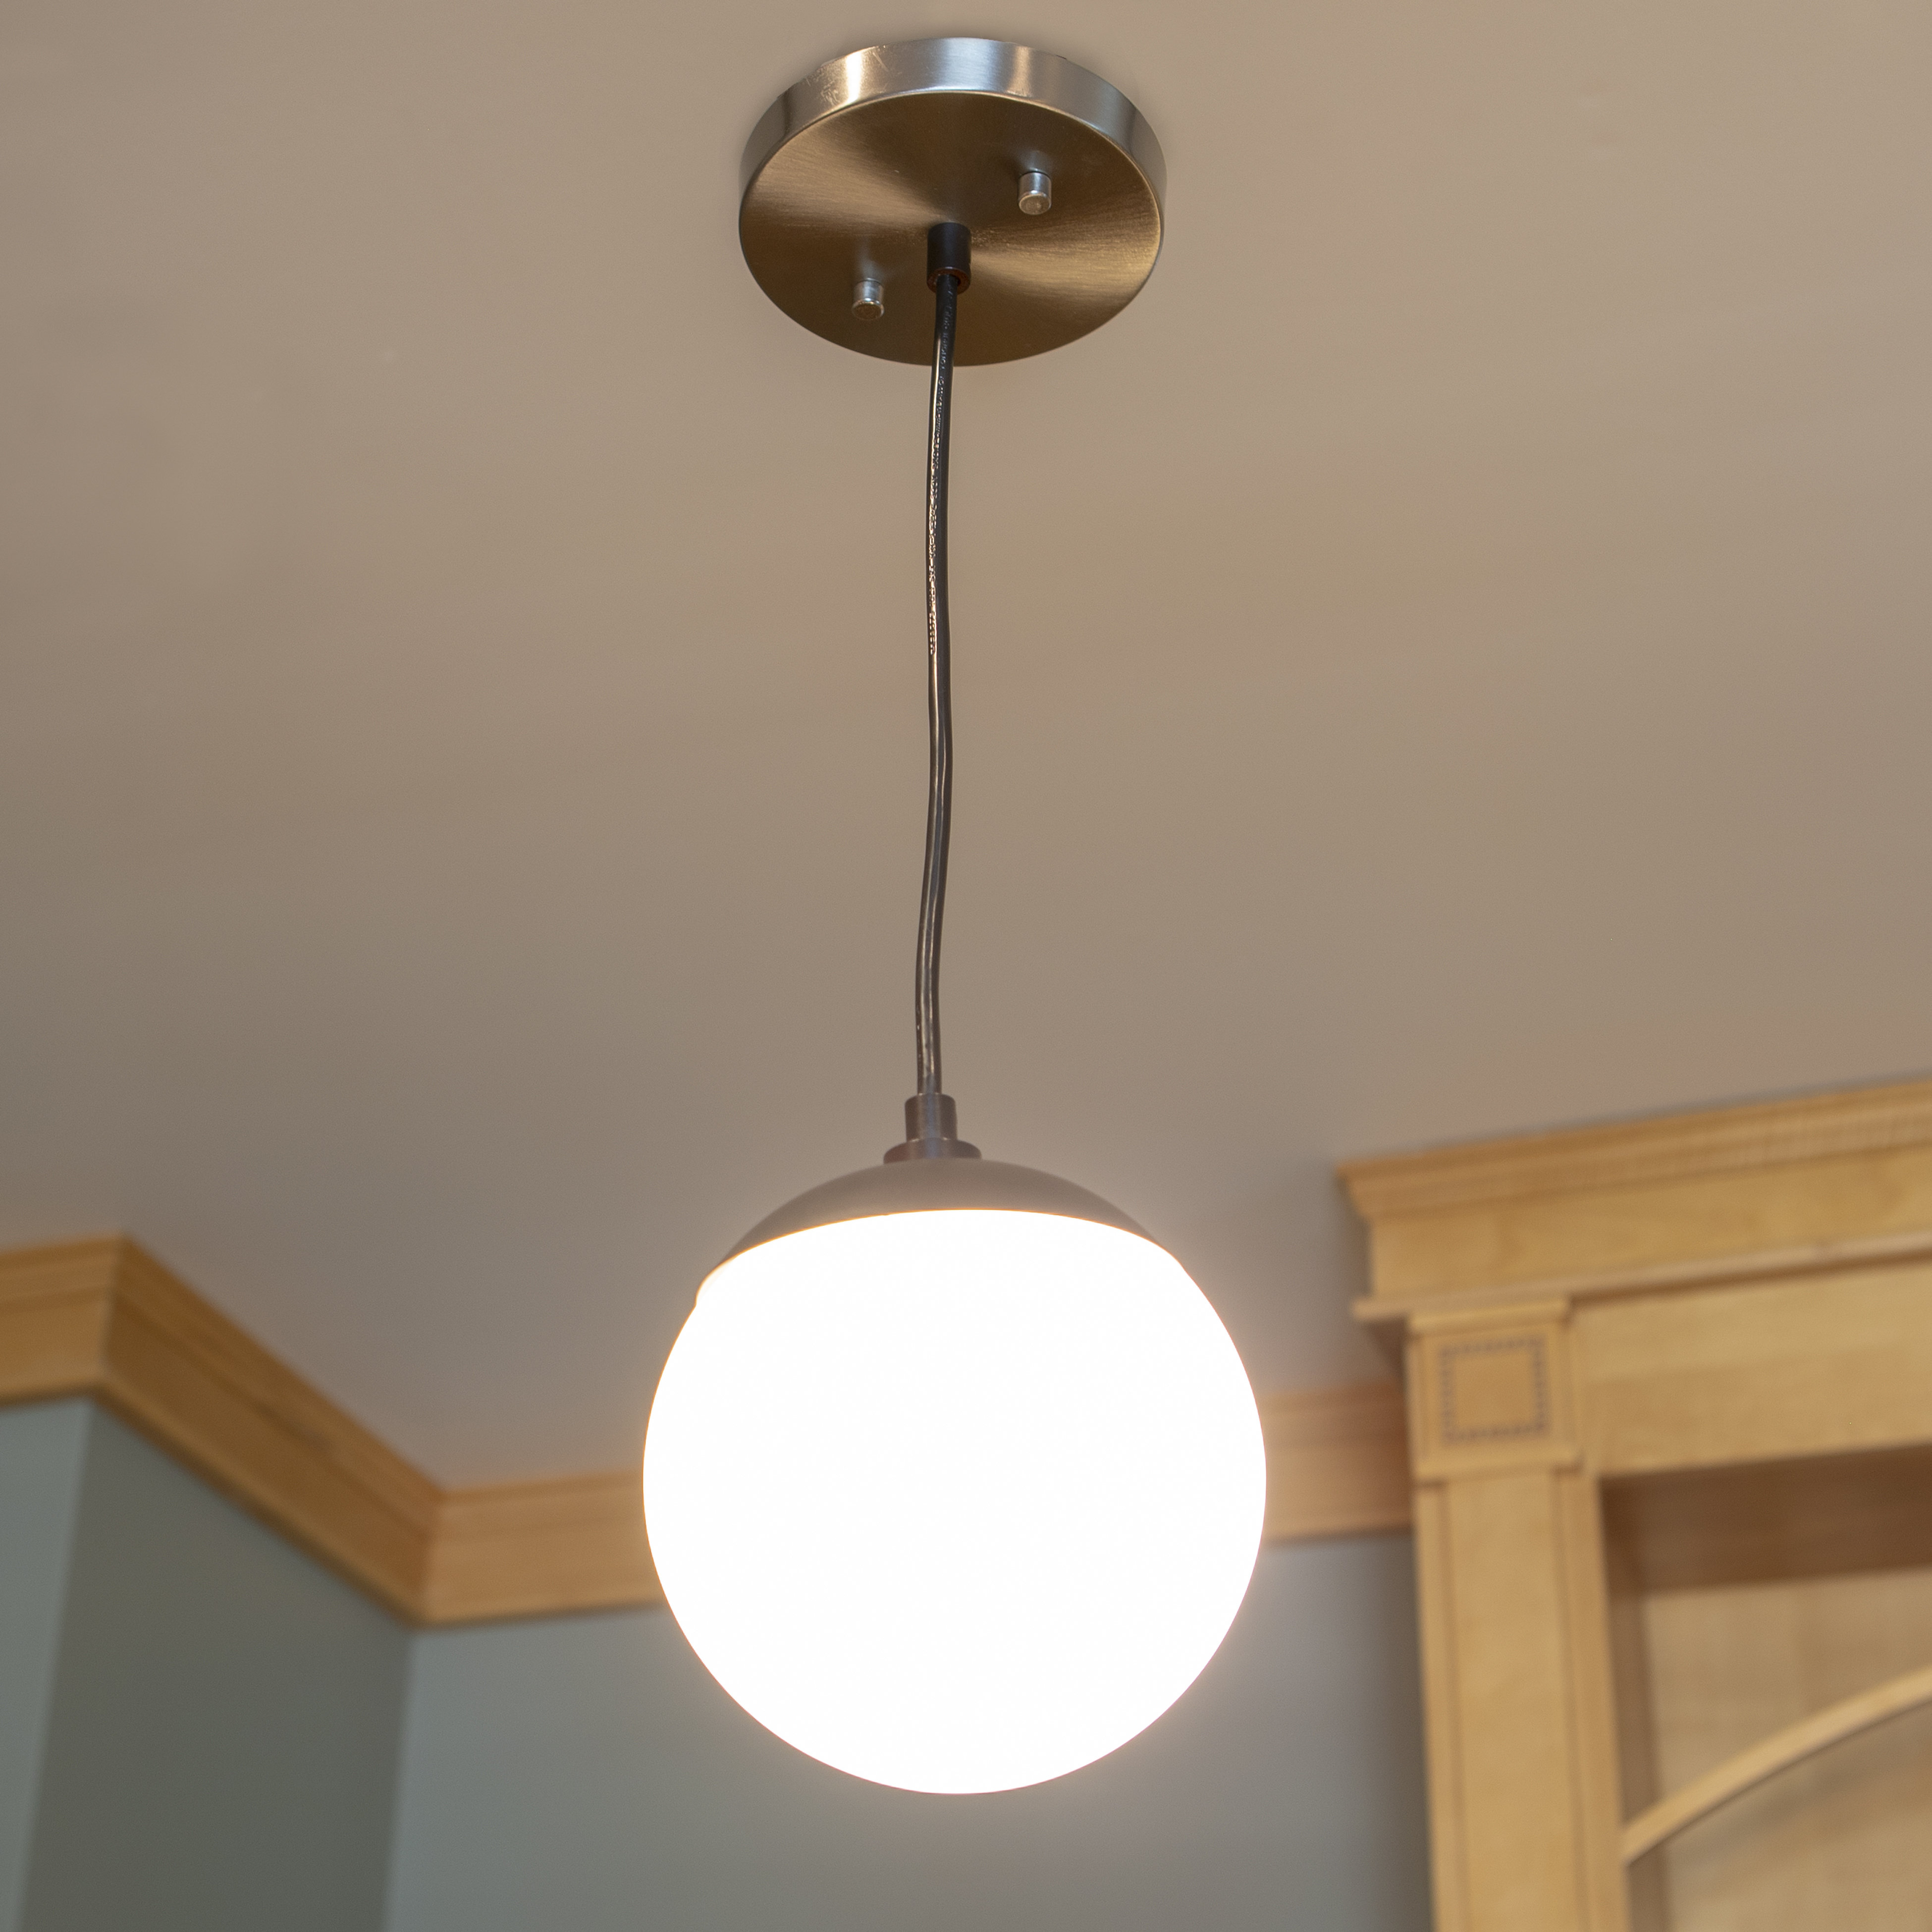 Eckstein 1 Light Globe Pendant With Regard To Bautista 1 Light Single Globe Pendants (Photo 22 of 30)